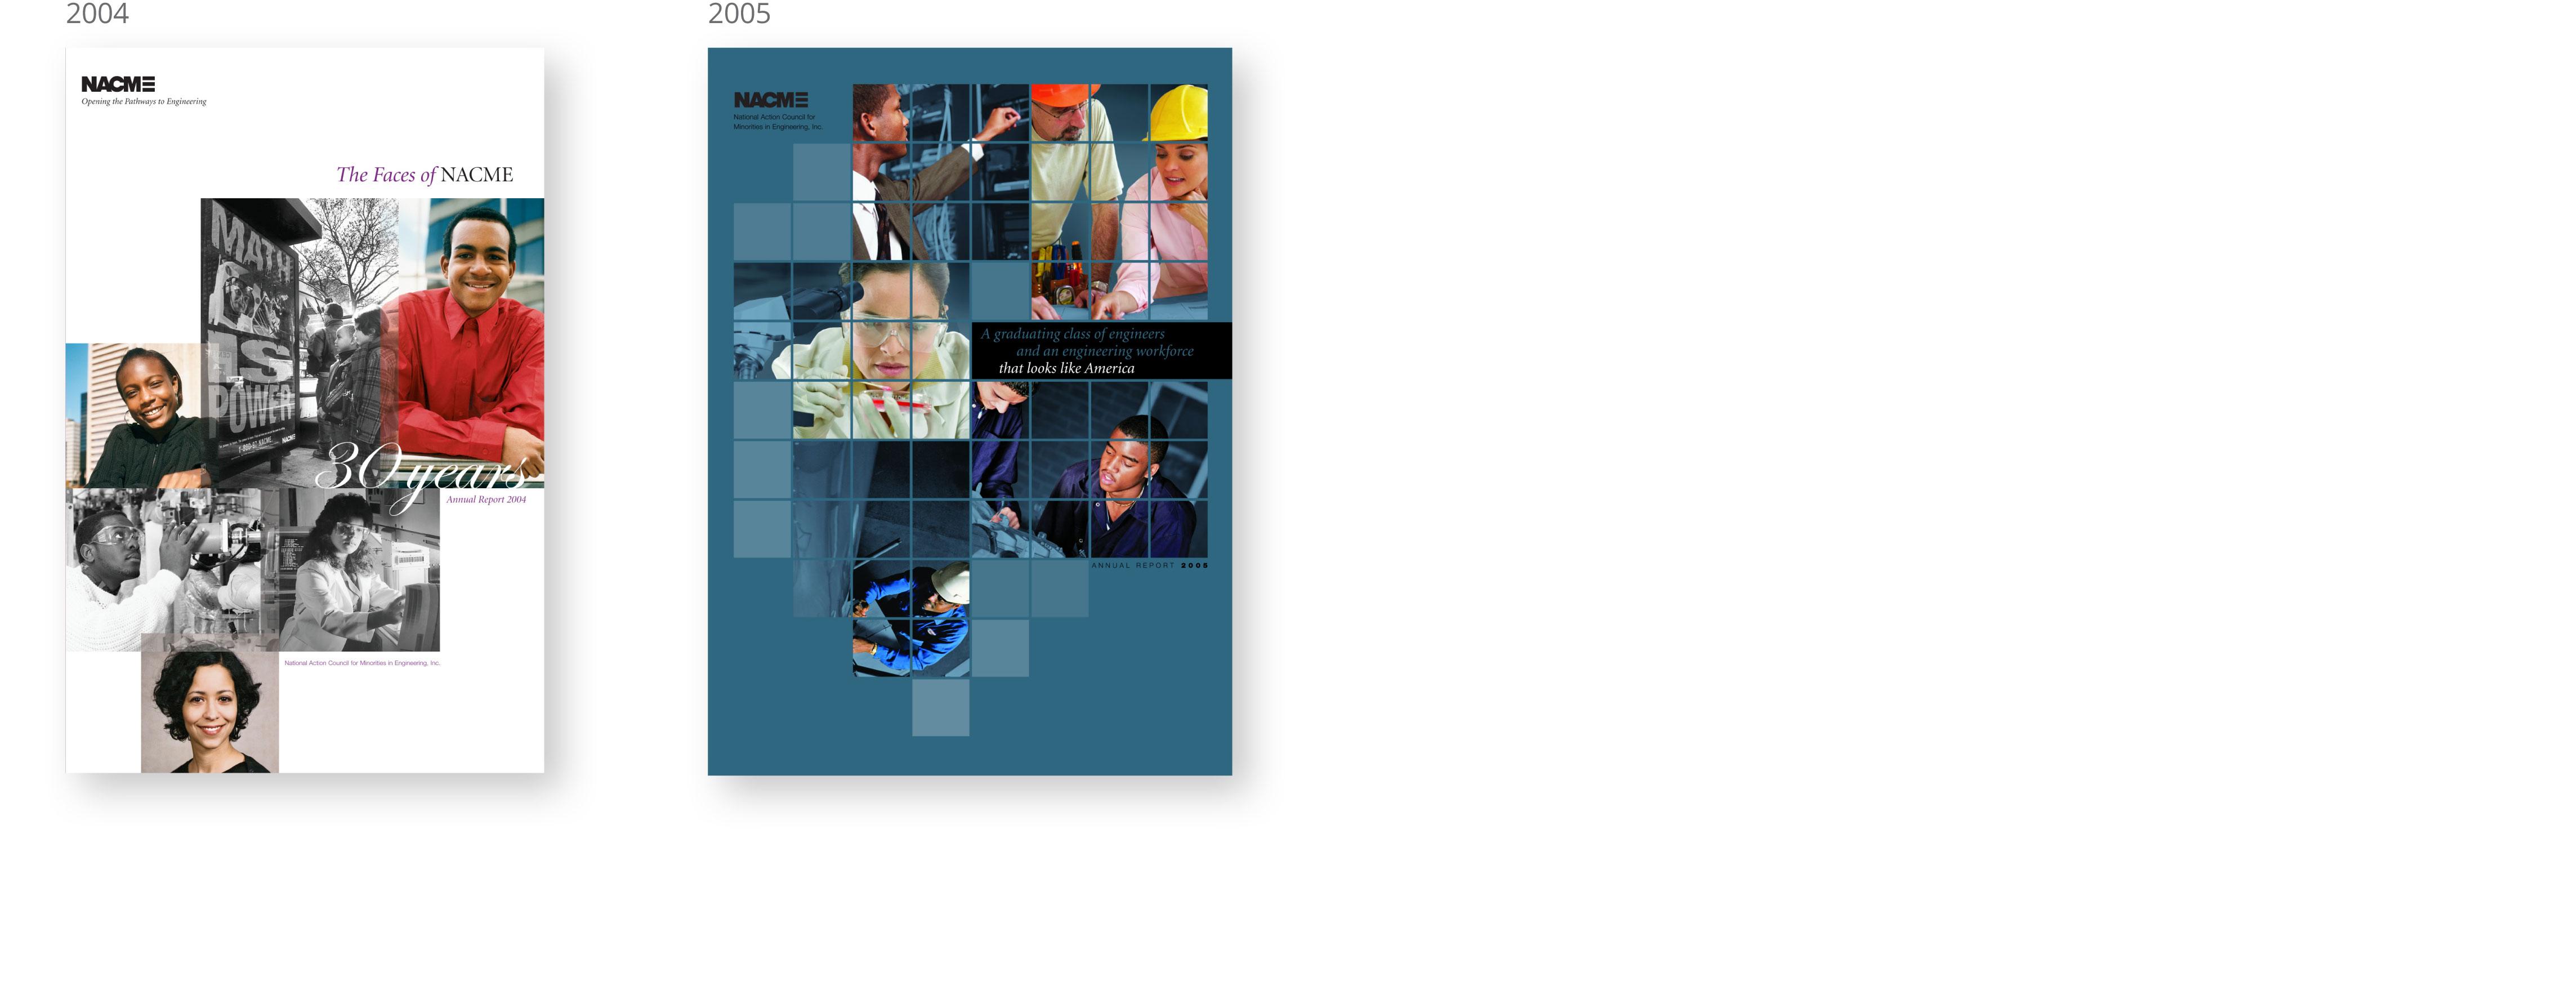 2004 annual report, nacme, brand design, nonprofit, new york, james wawrzewski